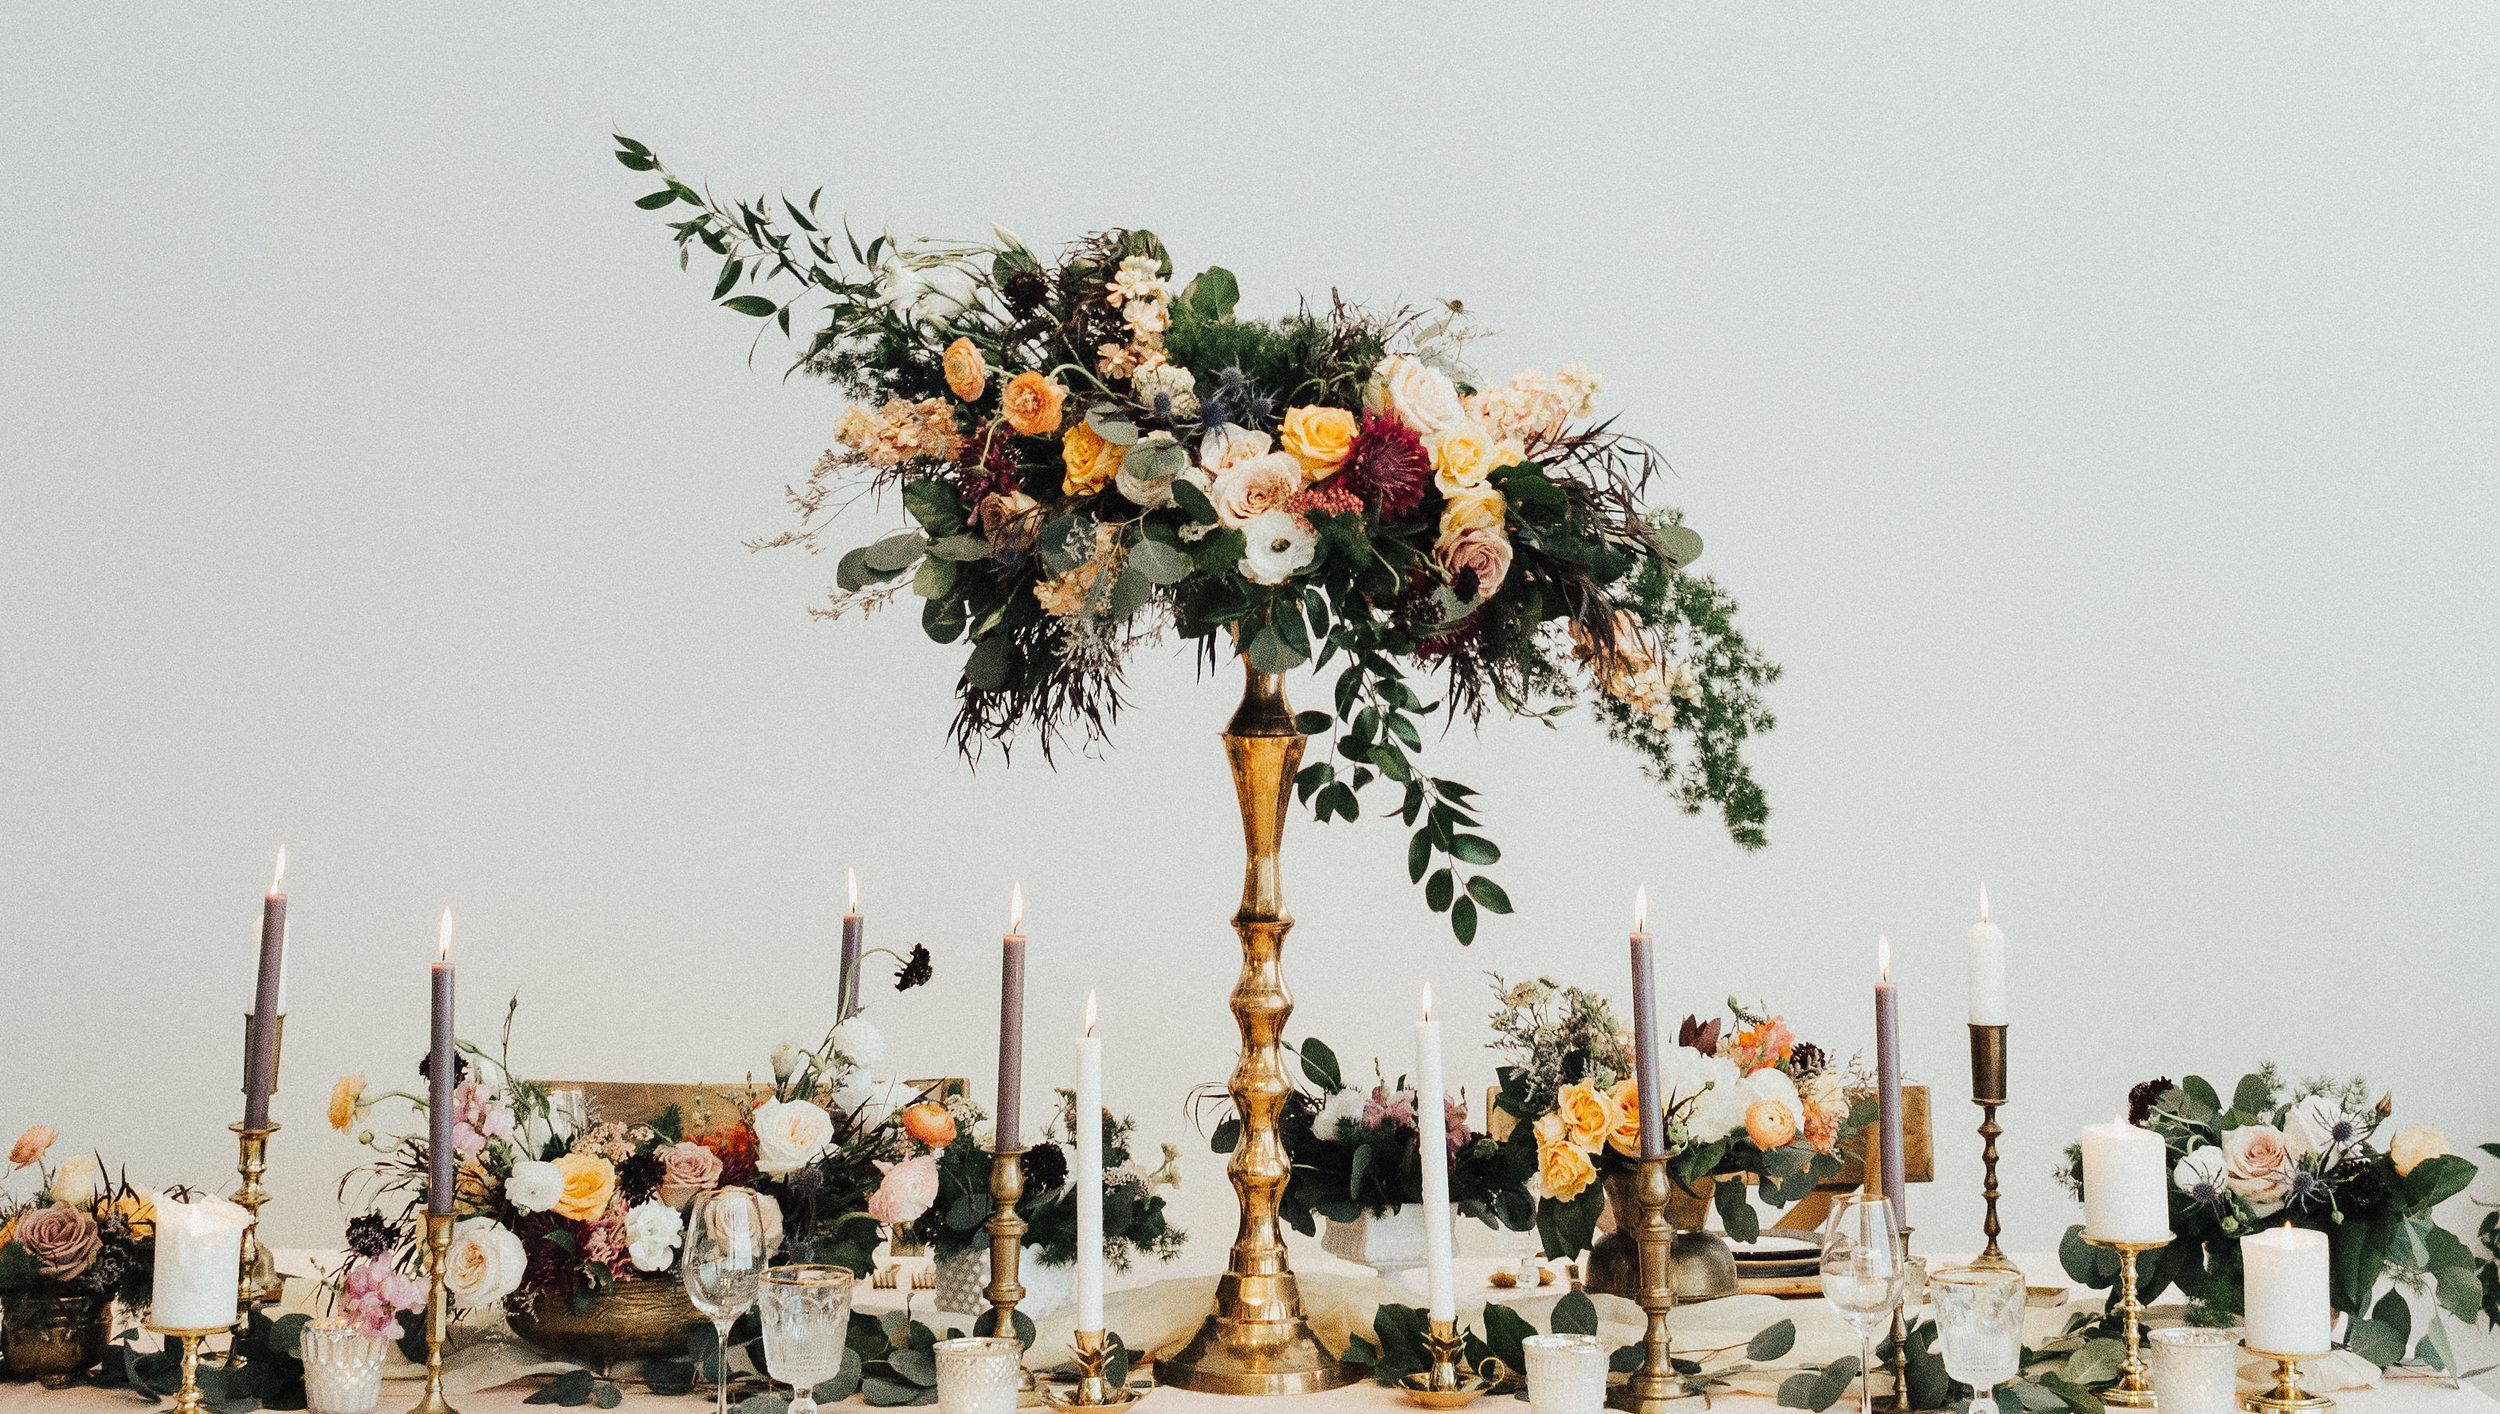 KCMO wedding florist florals flowers shawnee Merriam Johnson county weddings 20